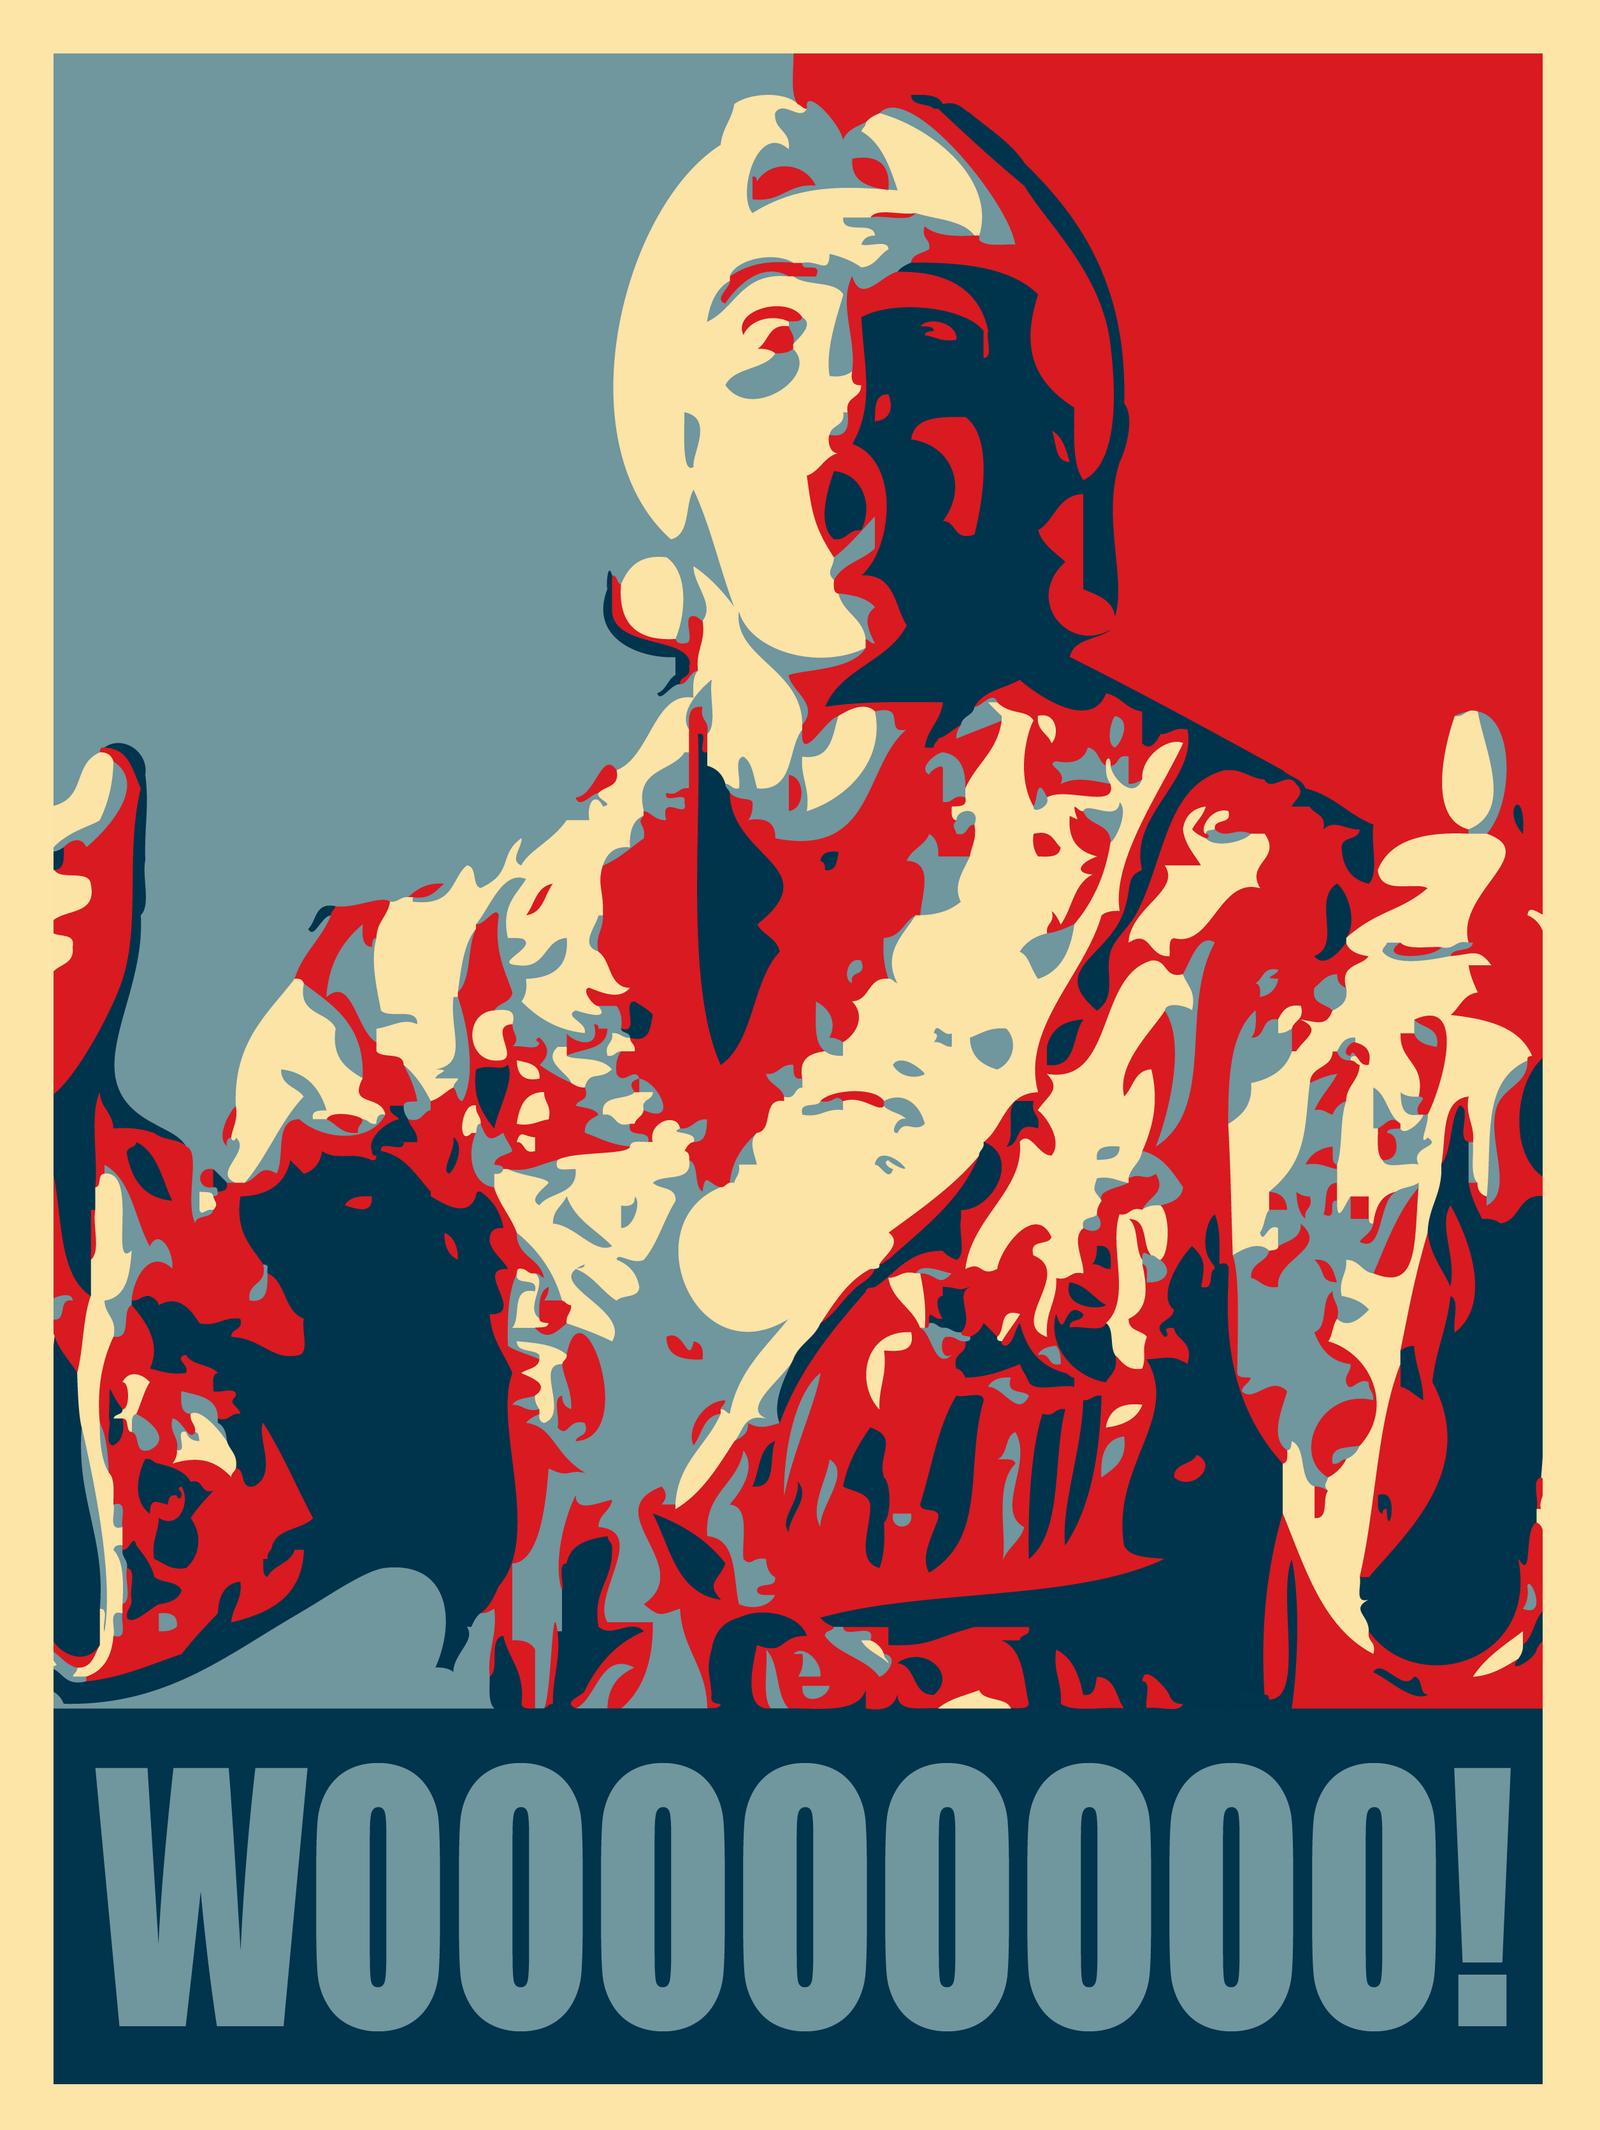 Ric Flair For Prez...? by MrAngryDog